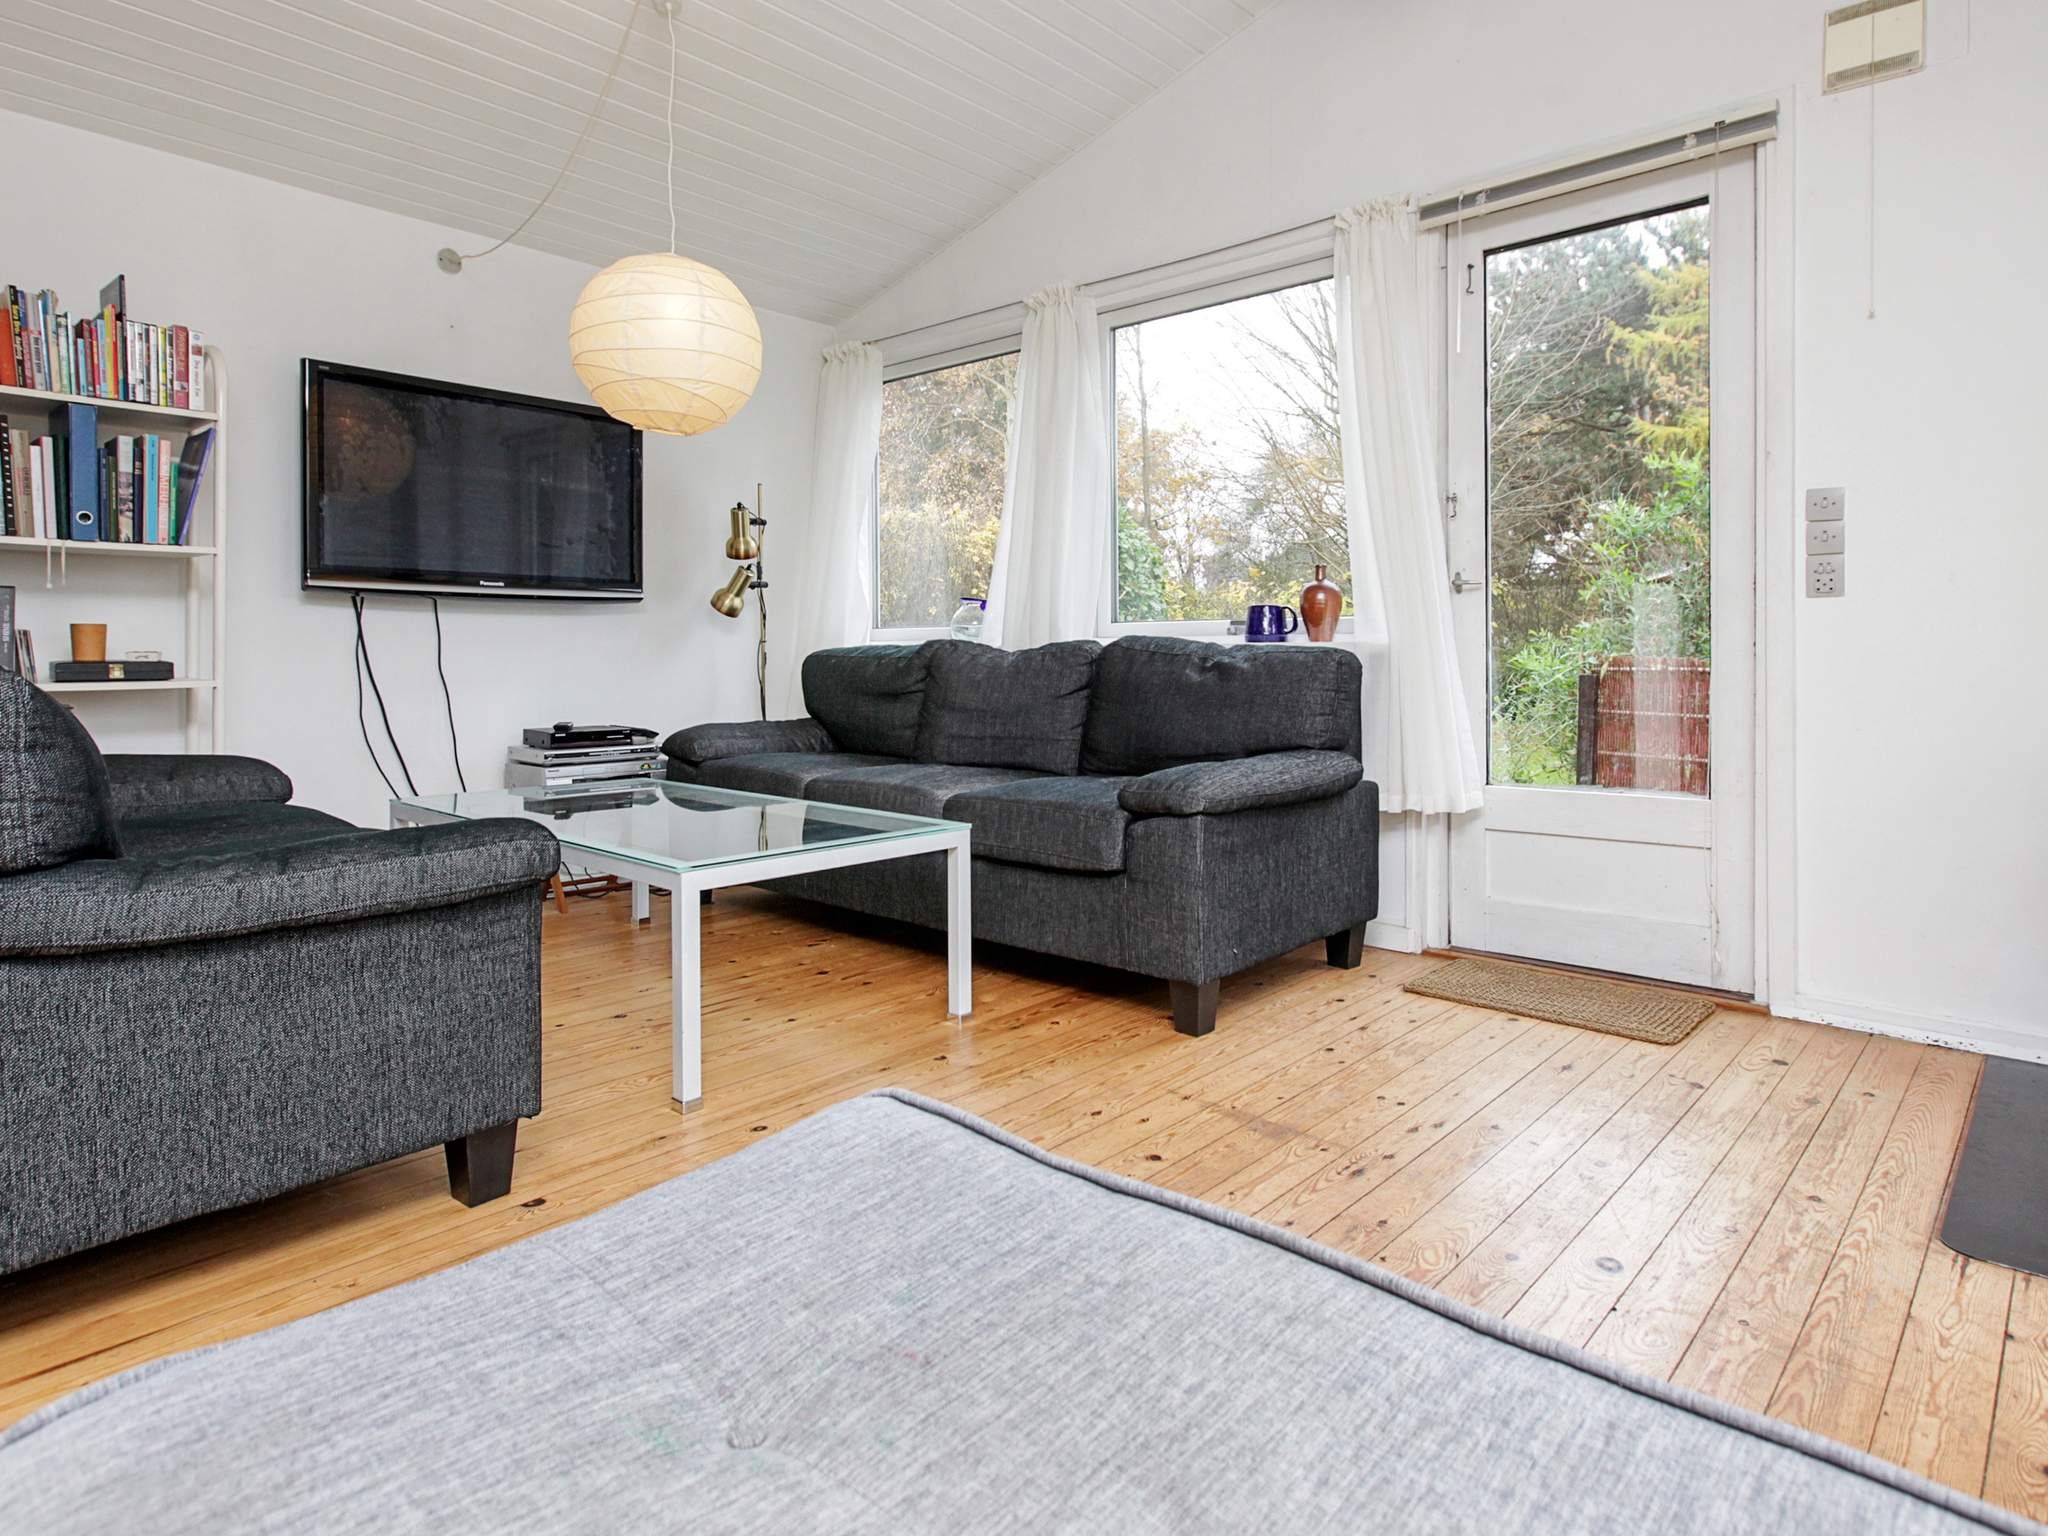 Ferienhaus Røsnæs (125855), Kalundborg, , Westseeland, Dänemark, Bild 6